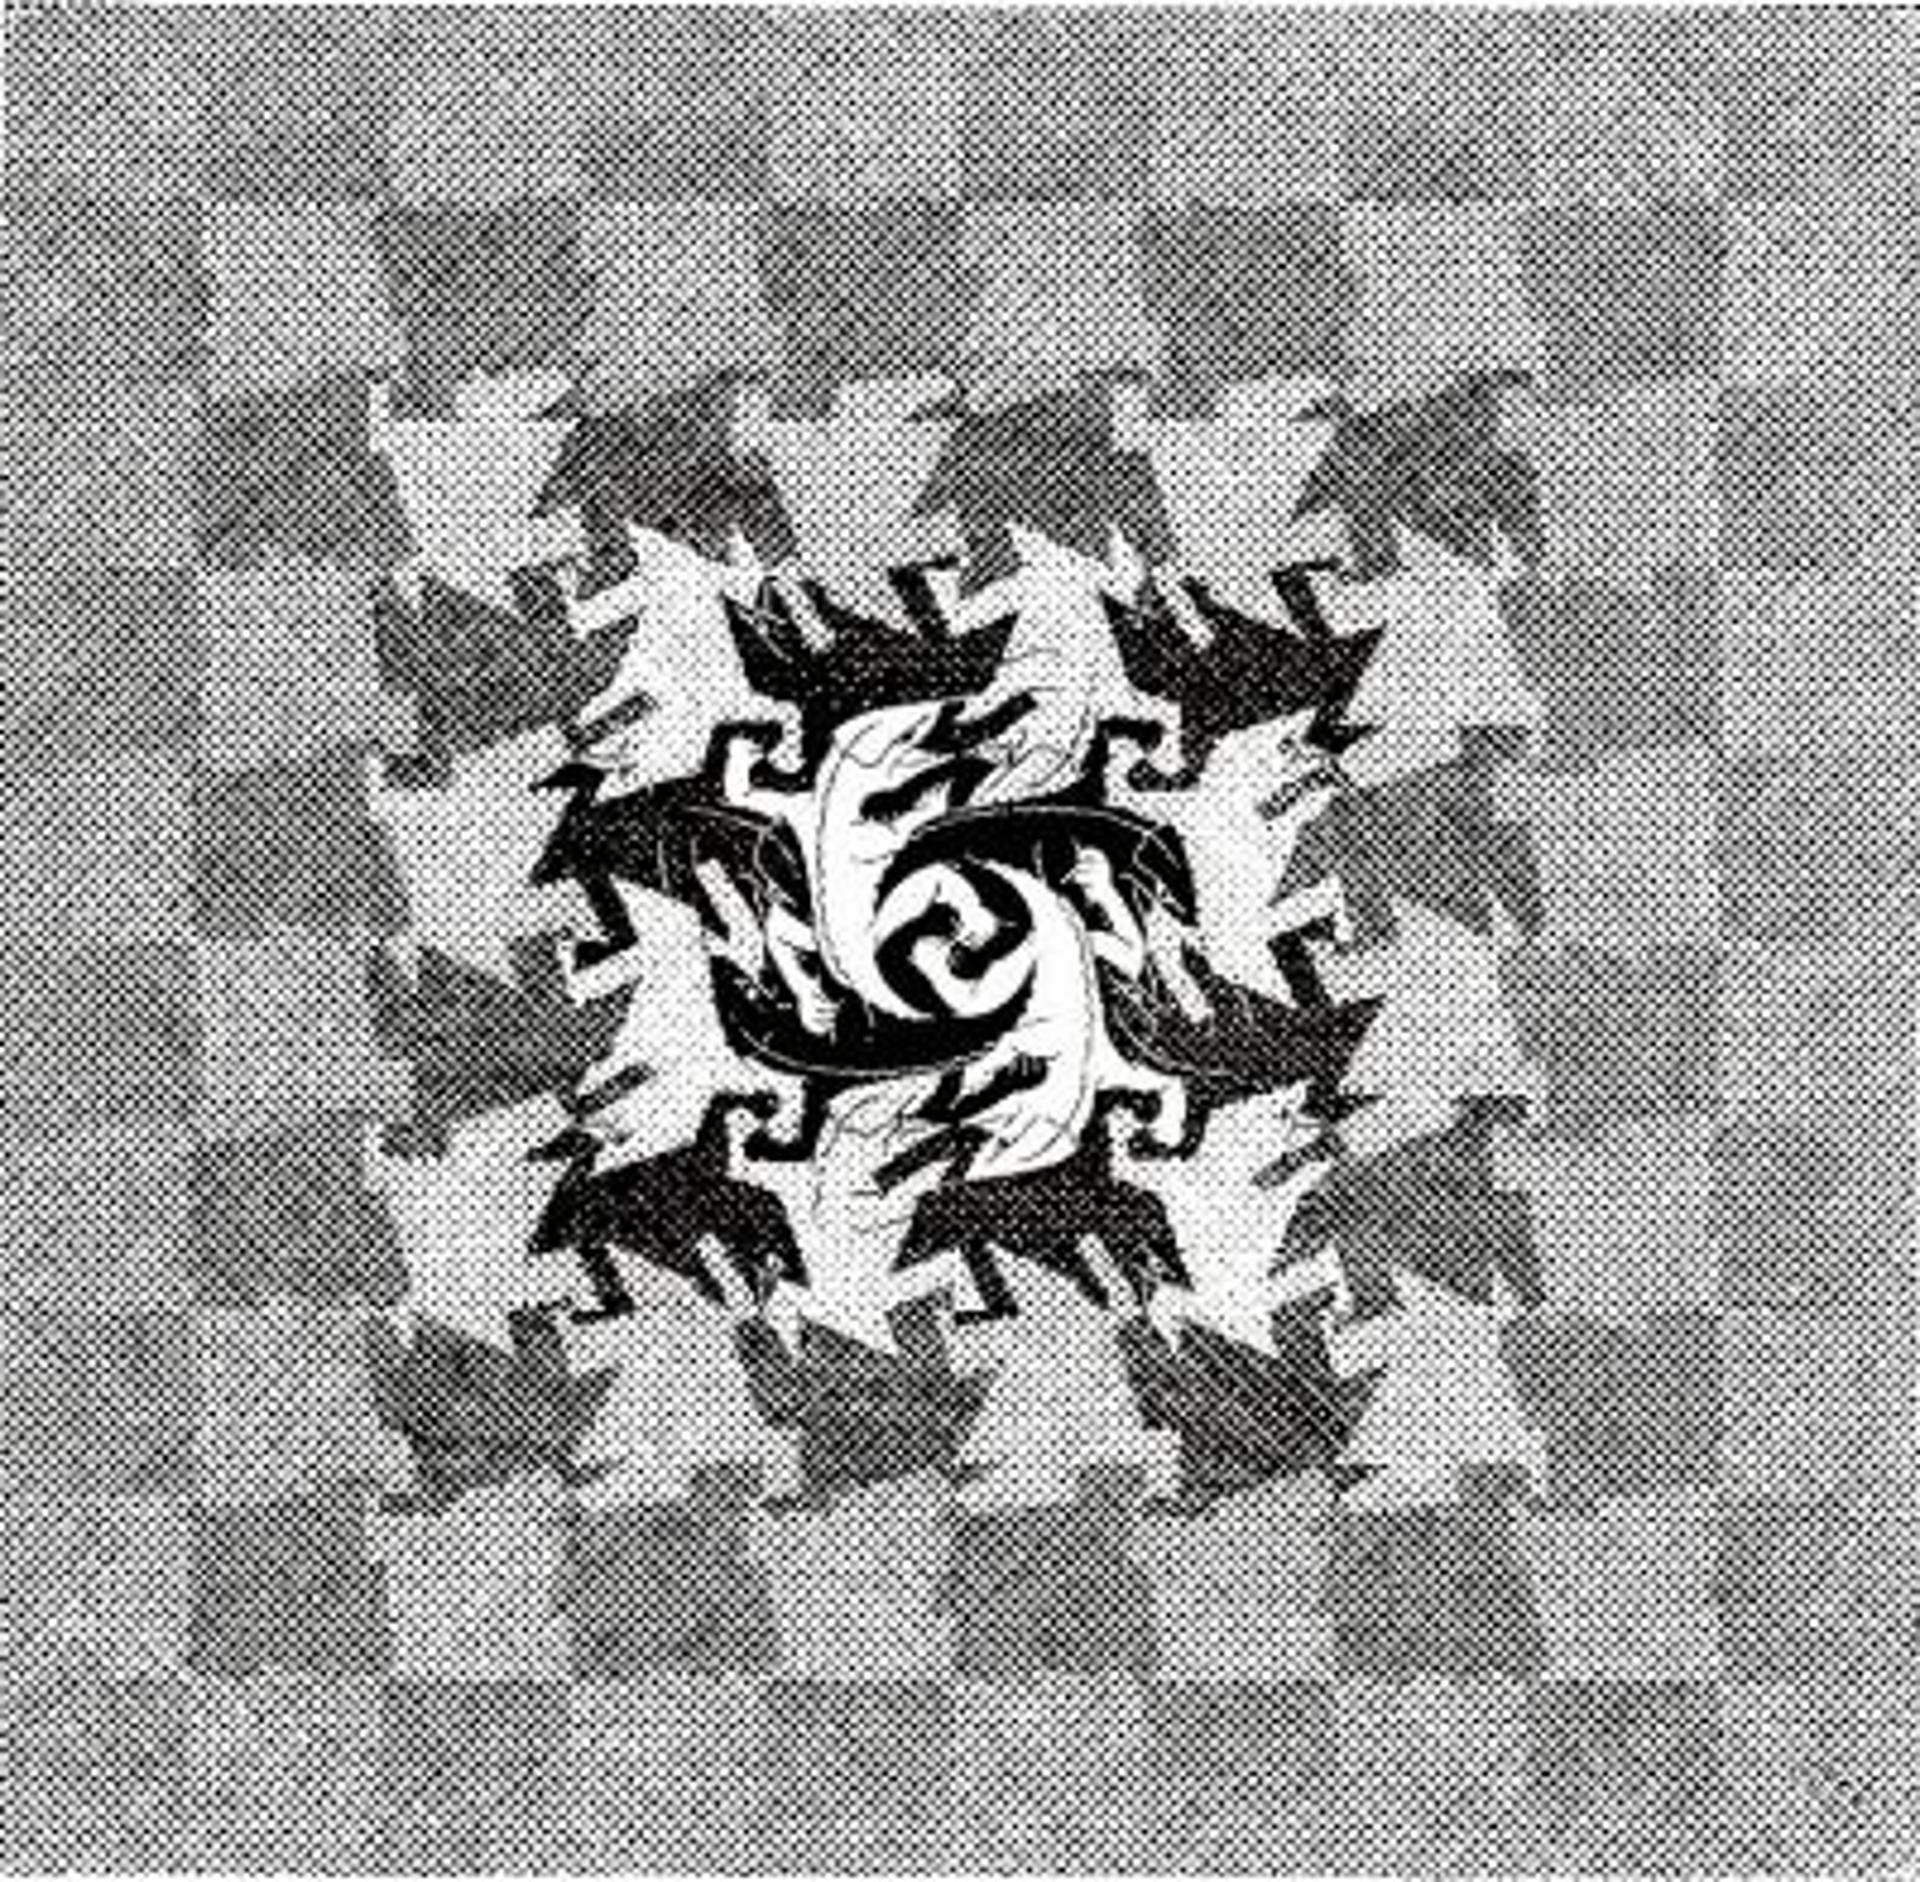 Development I by M.C. Escher